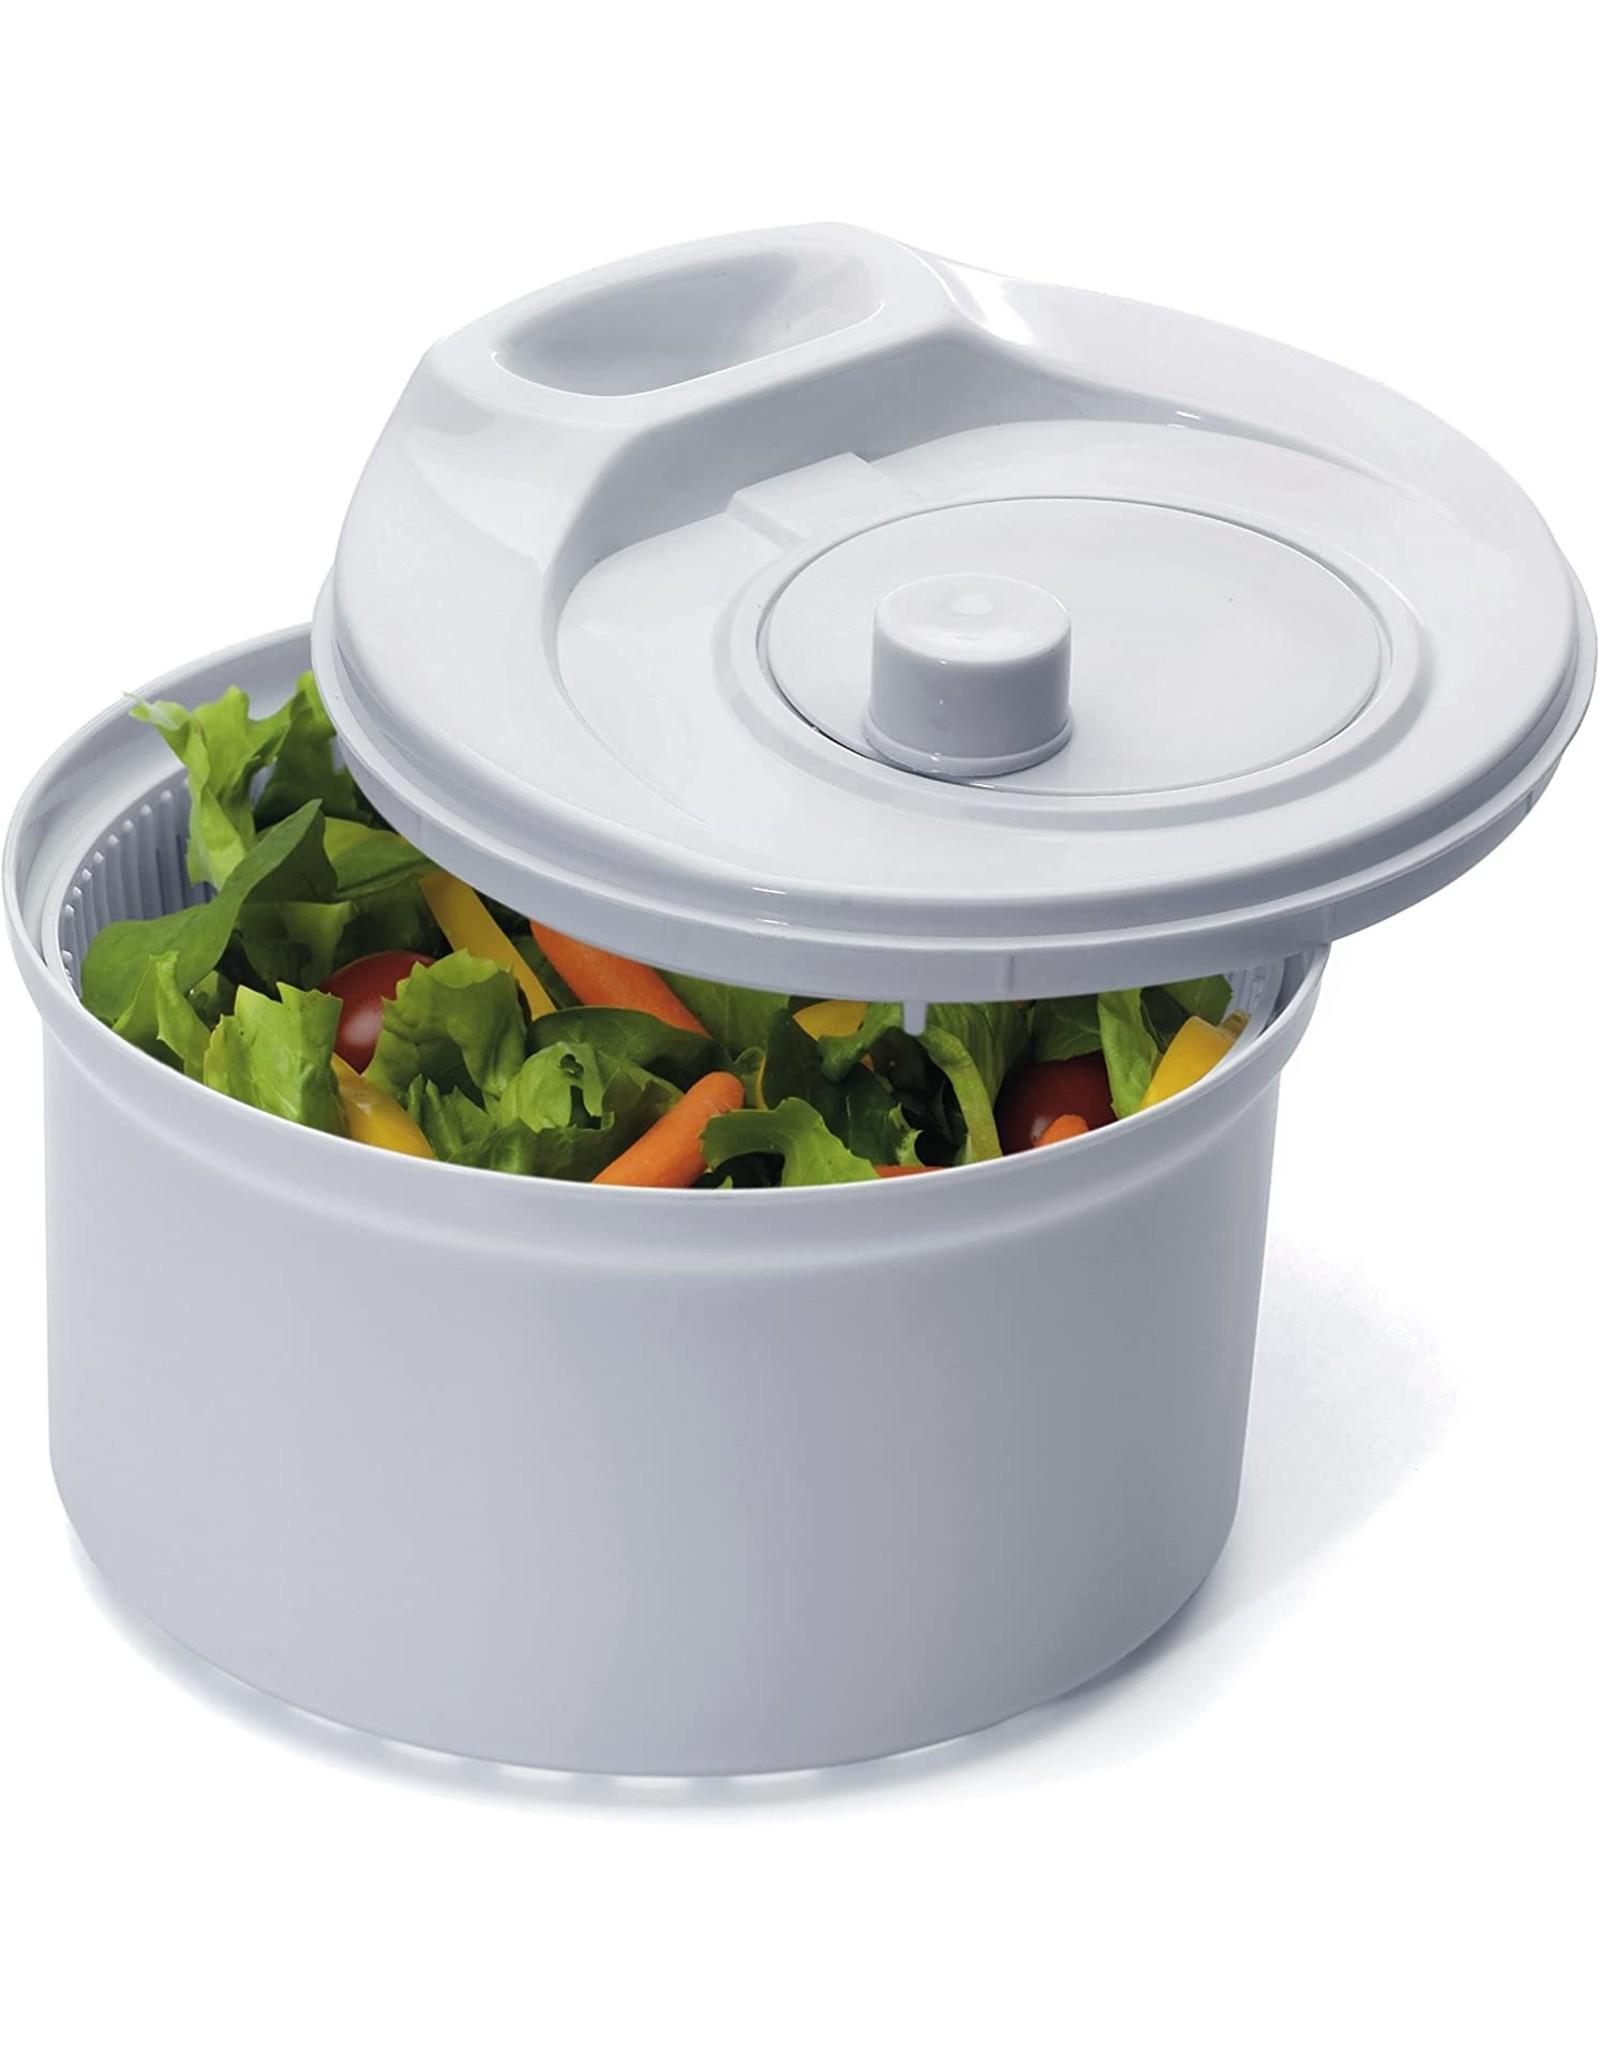 Progressive International Corp. Flow Through Salad Spinner